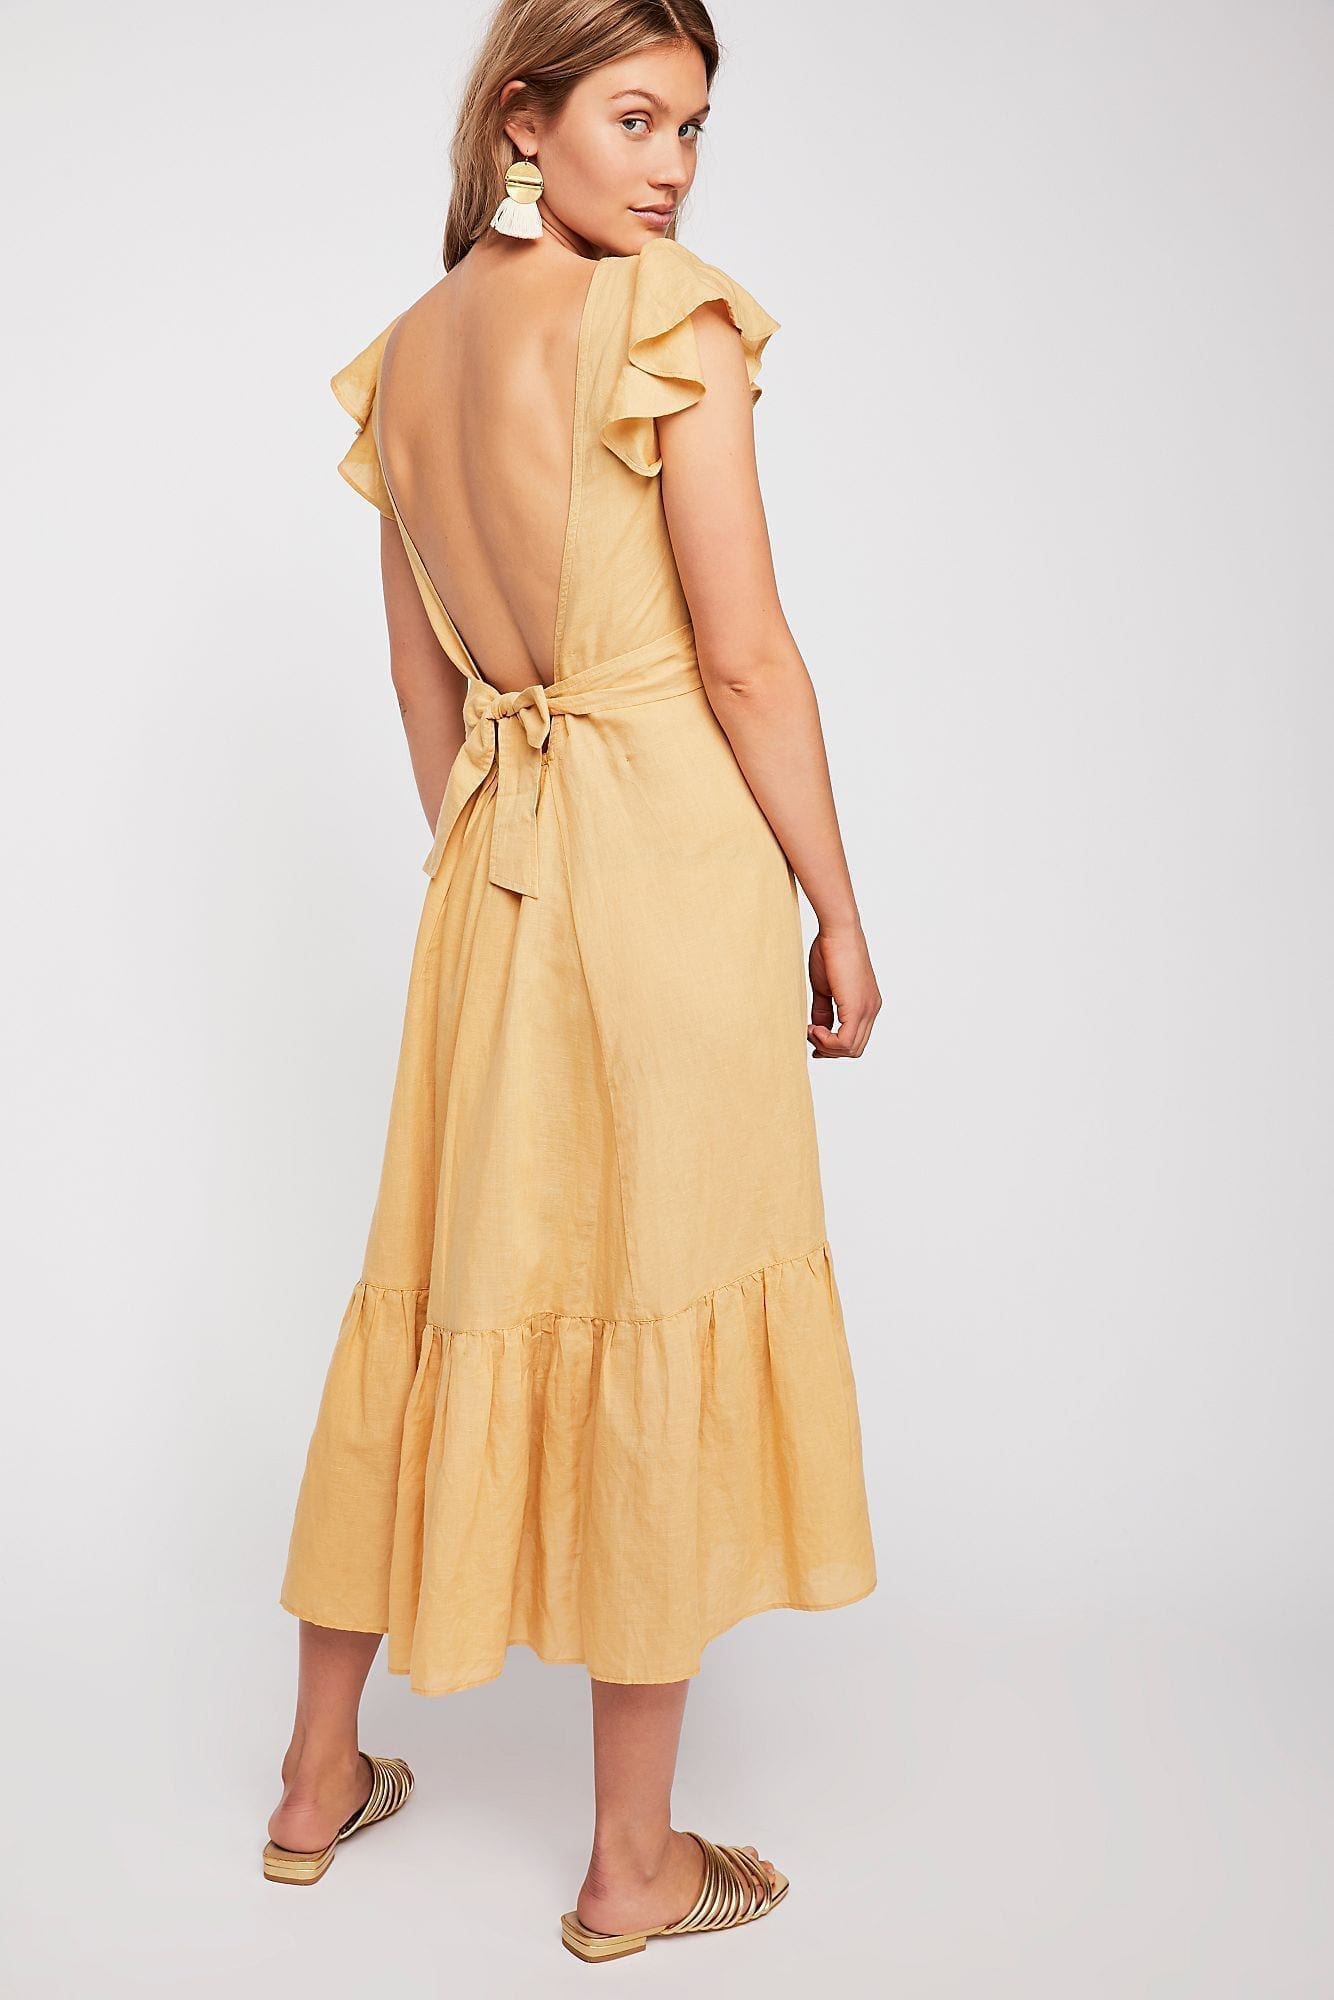 ENDLESS SUMMER Takin' A Chance Midi Yellow Dress